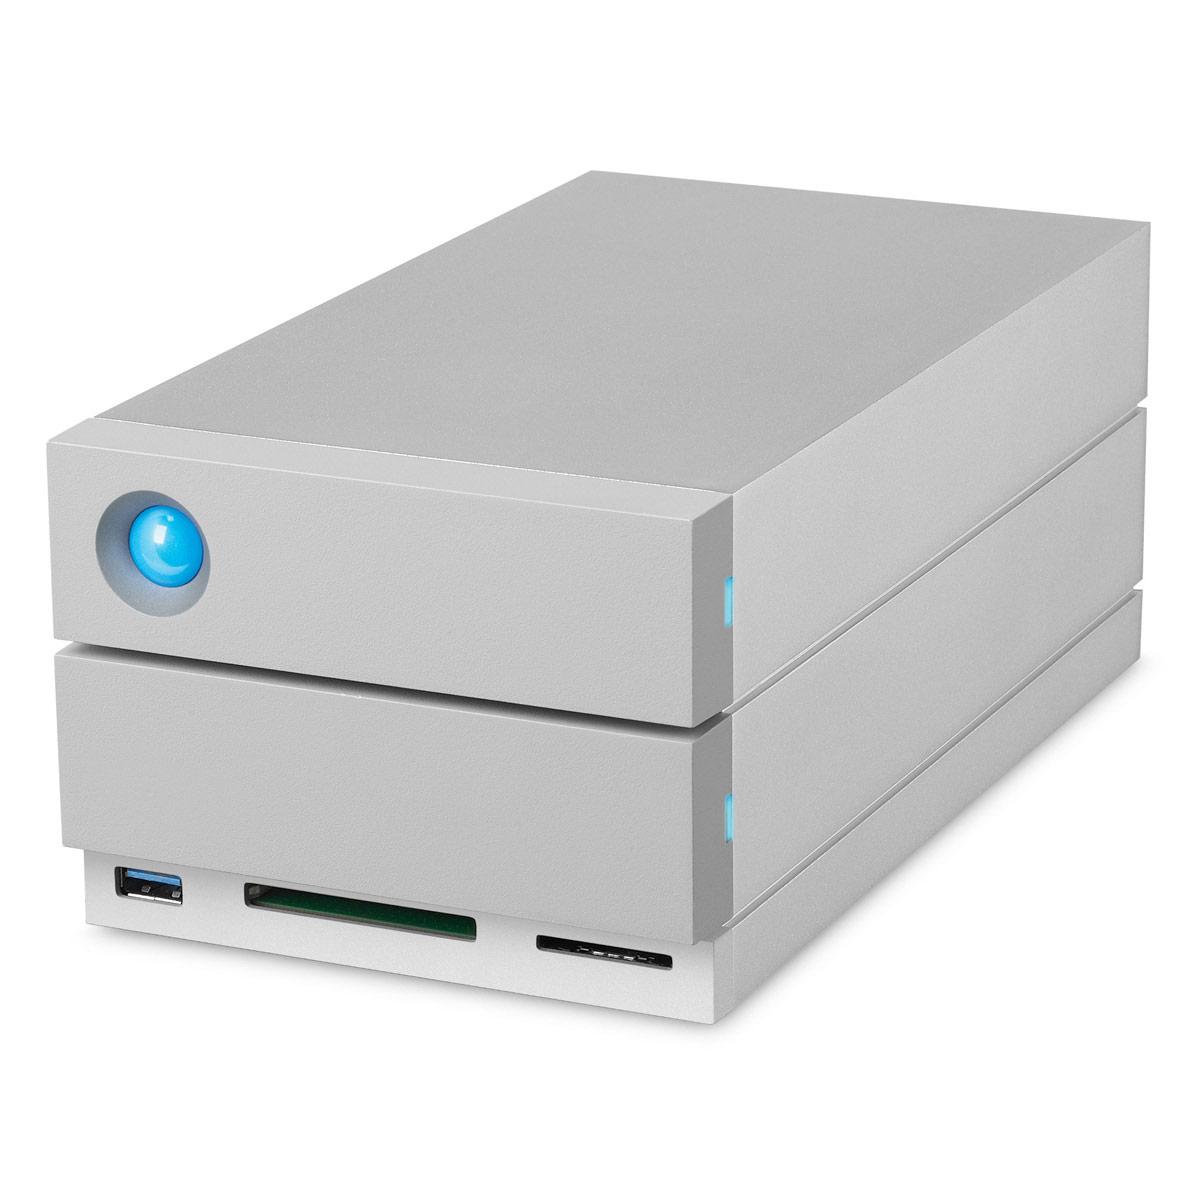 LaCie 2big Dock 8TB Thunderbolt3 & USB-C Drive & Docking Station